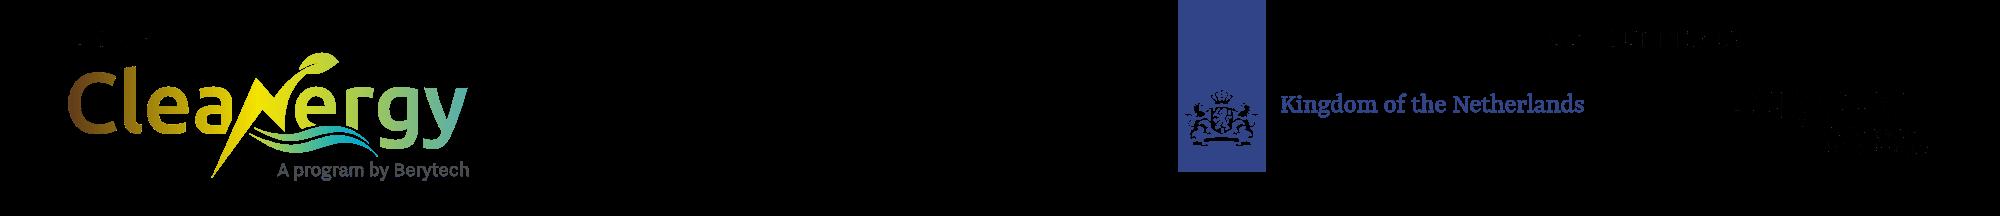 Cleanergy logo strip